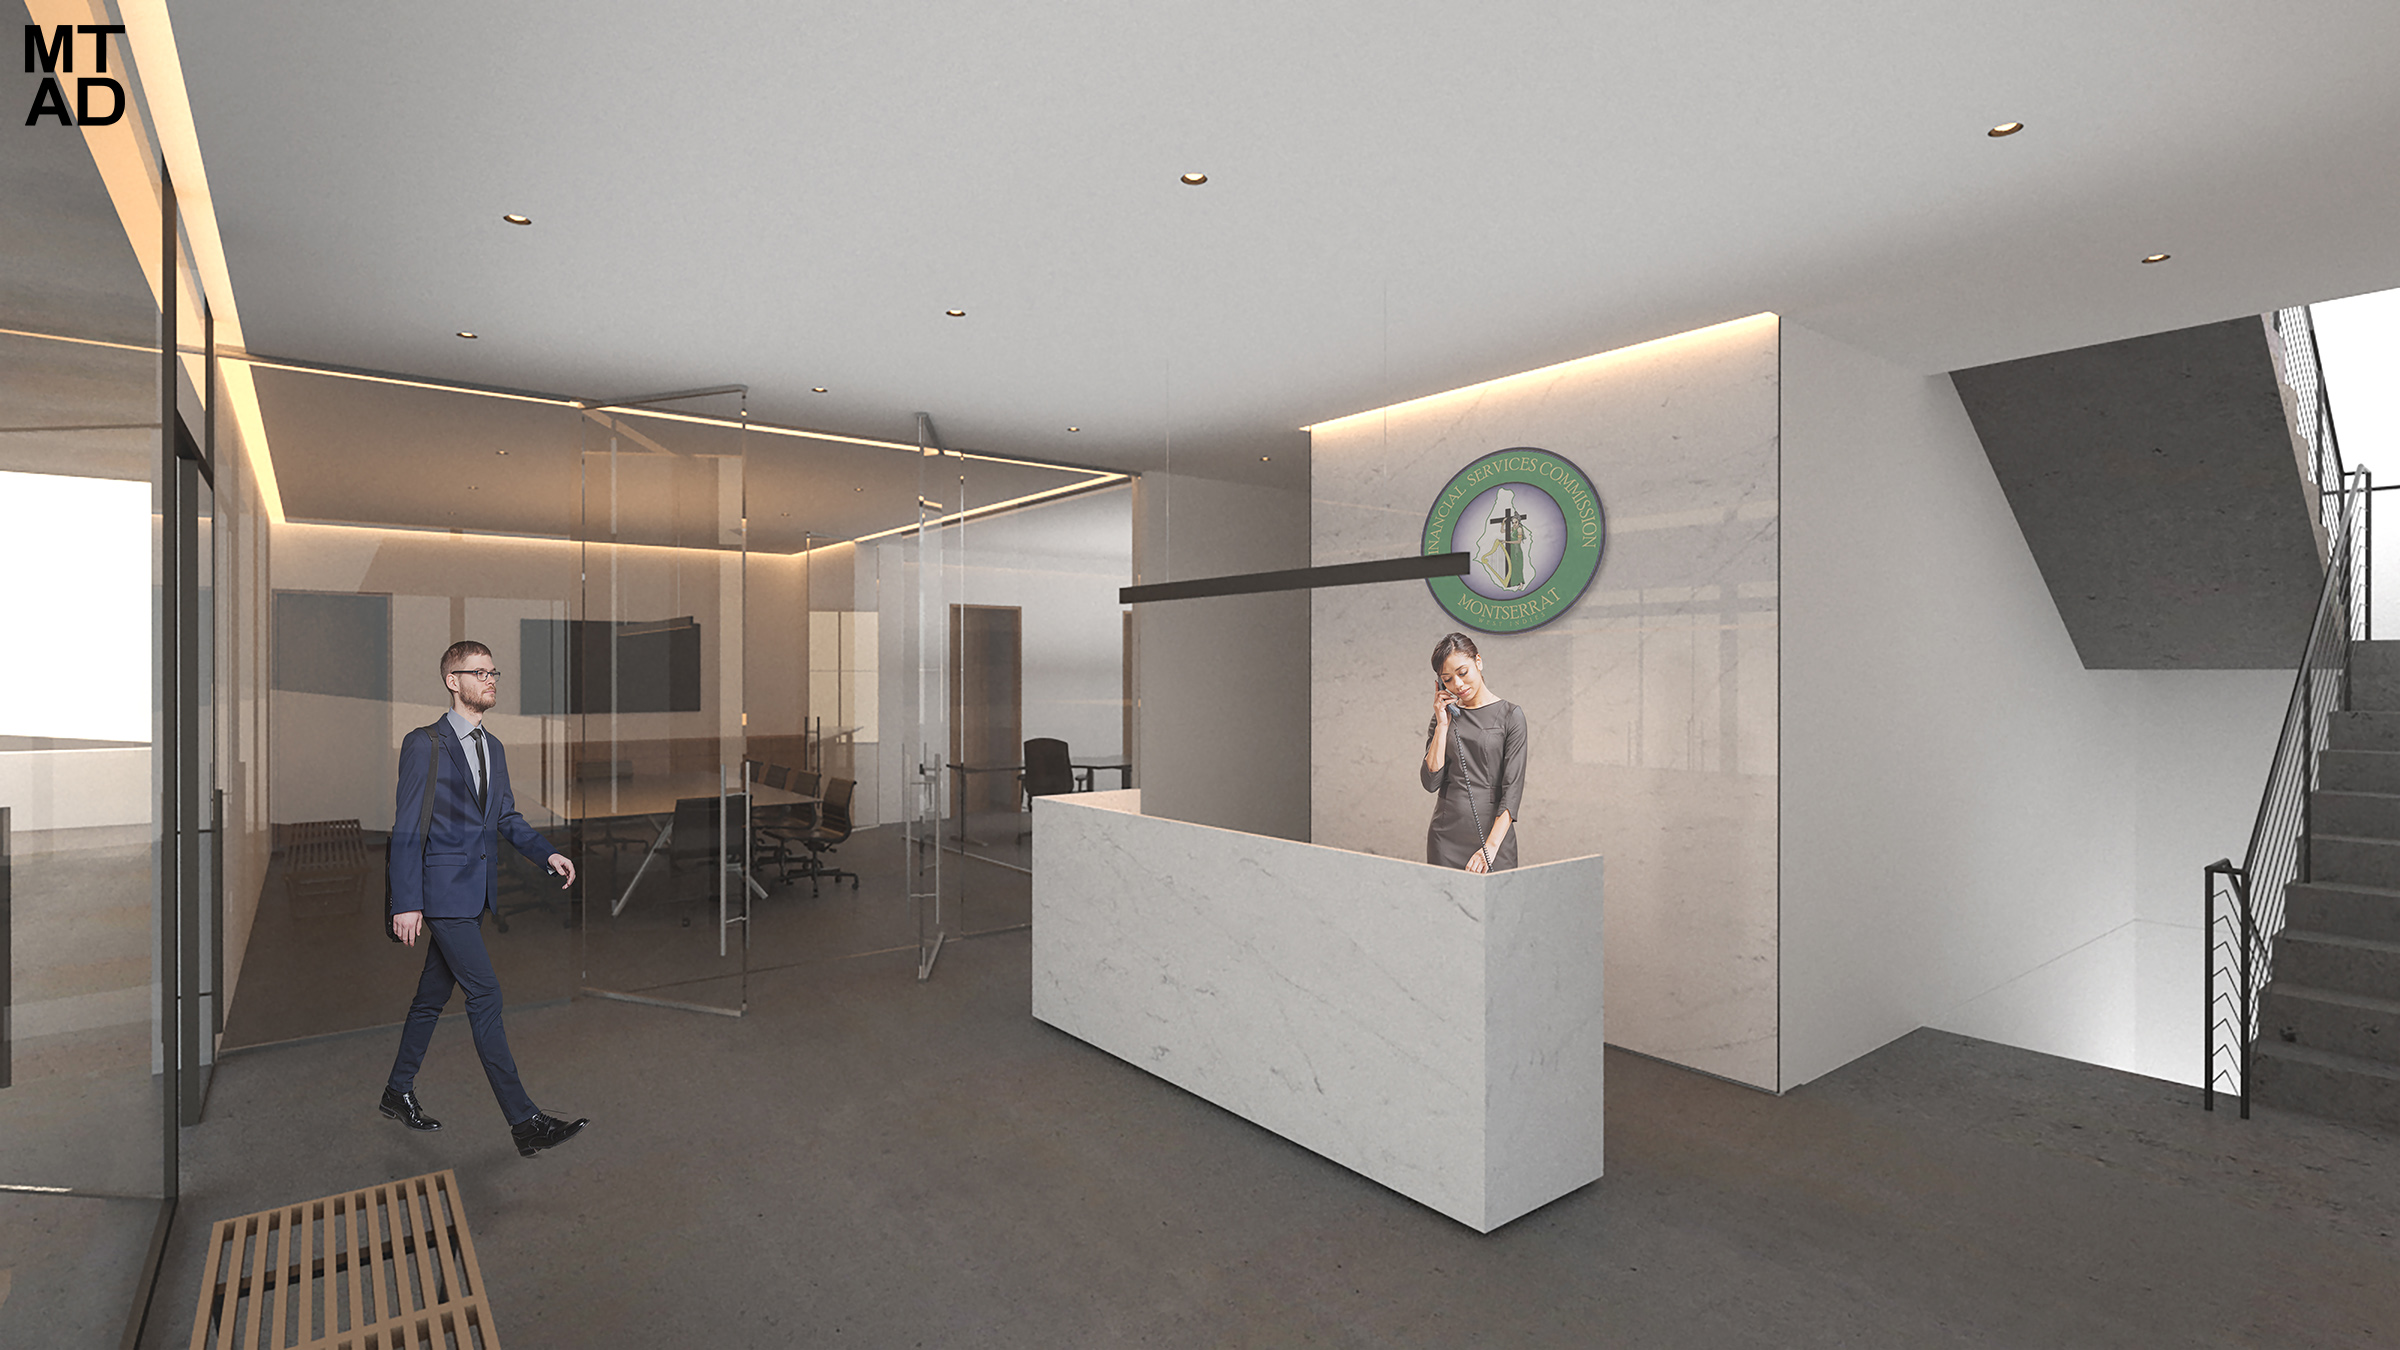 MTAD_MONTSERRAT FINANCIAL SERVICES BUILDING 01.jpg